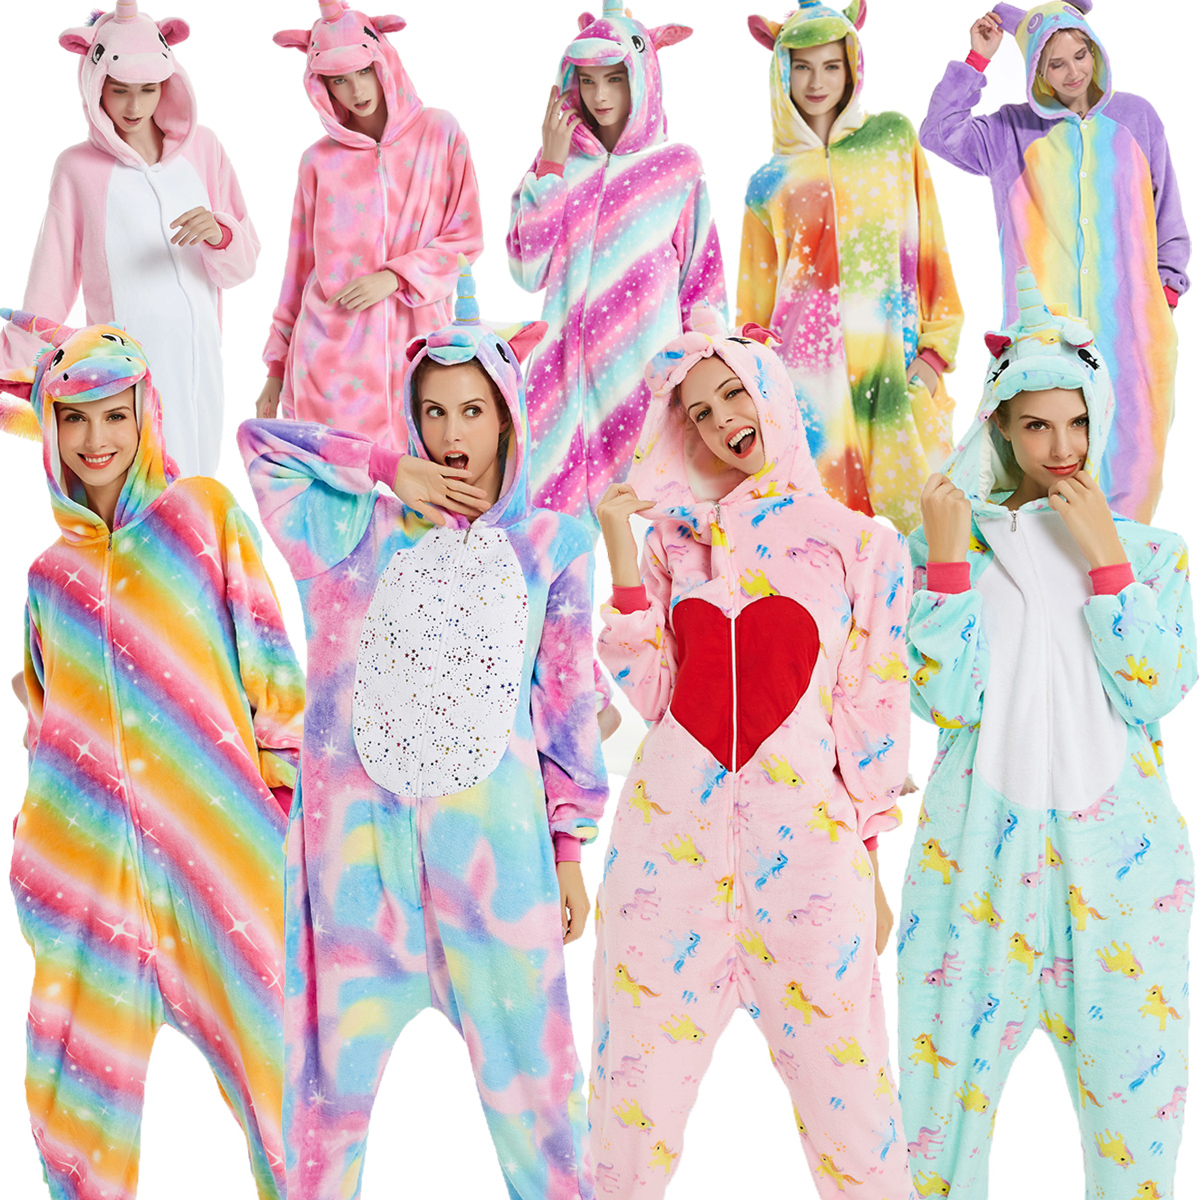 Kigurumi Suit For Adults Onesies Animal Pajamas Women Sleepwear Pyjama Suits Unicorn Panda Wolf Onesies Unisex Cartoon Pijama